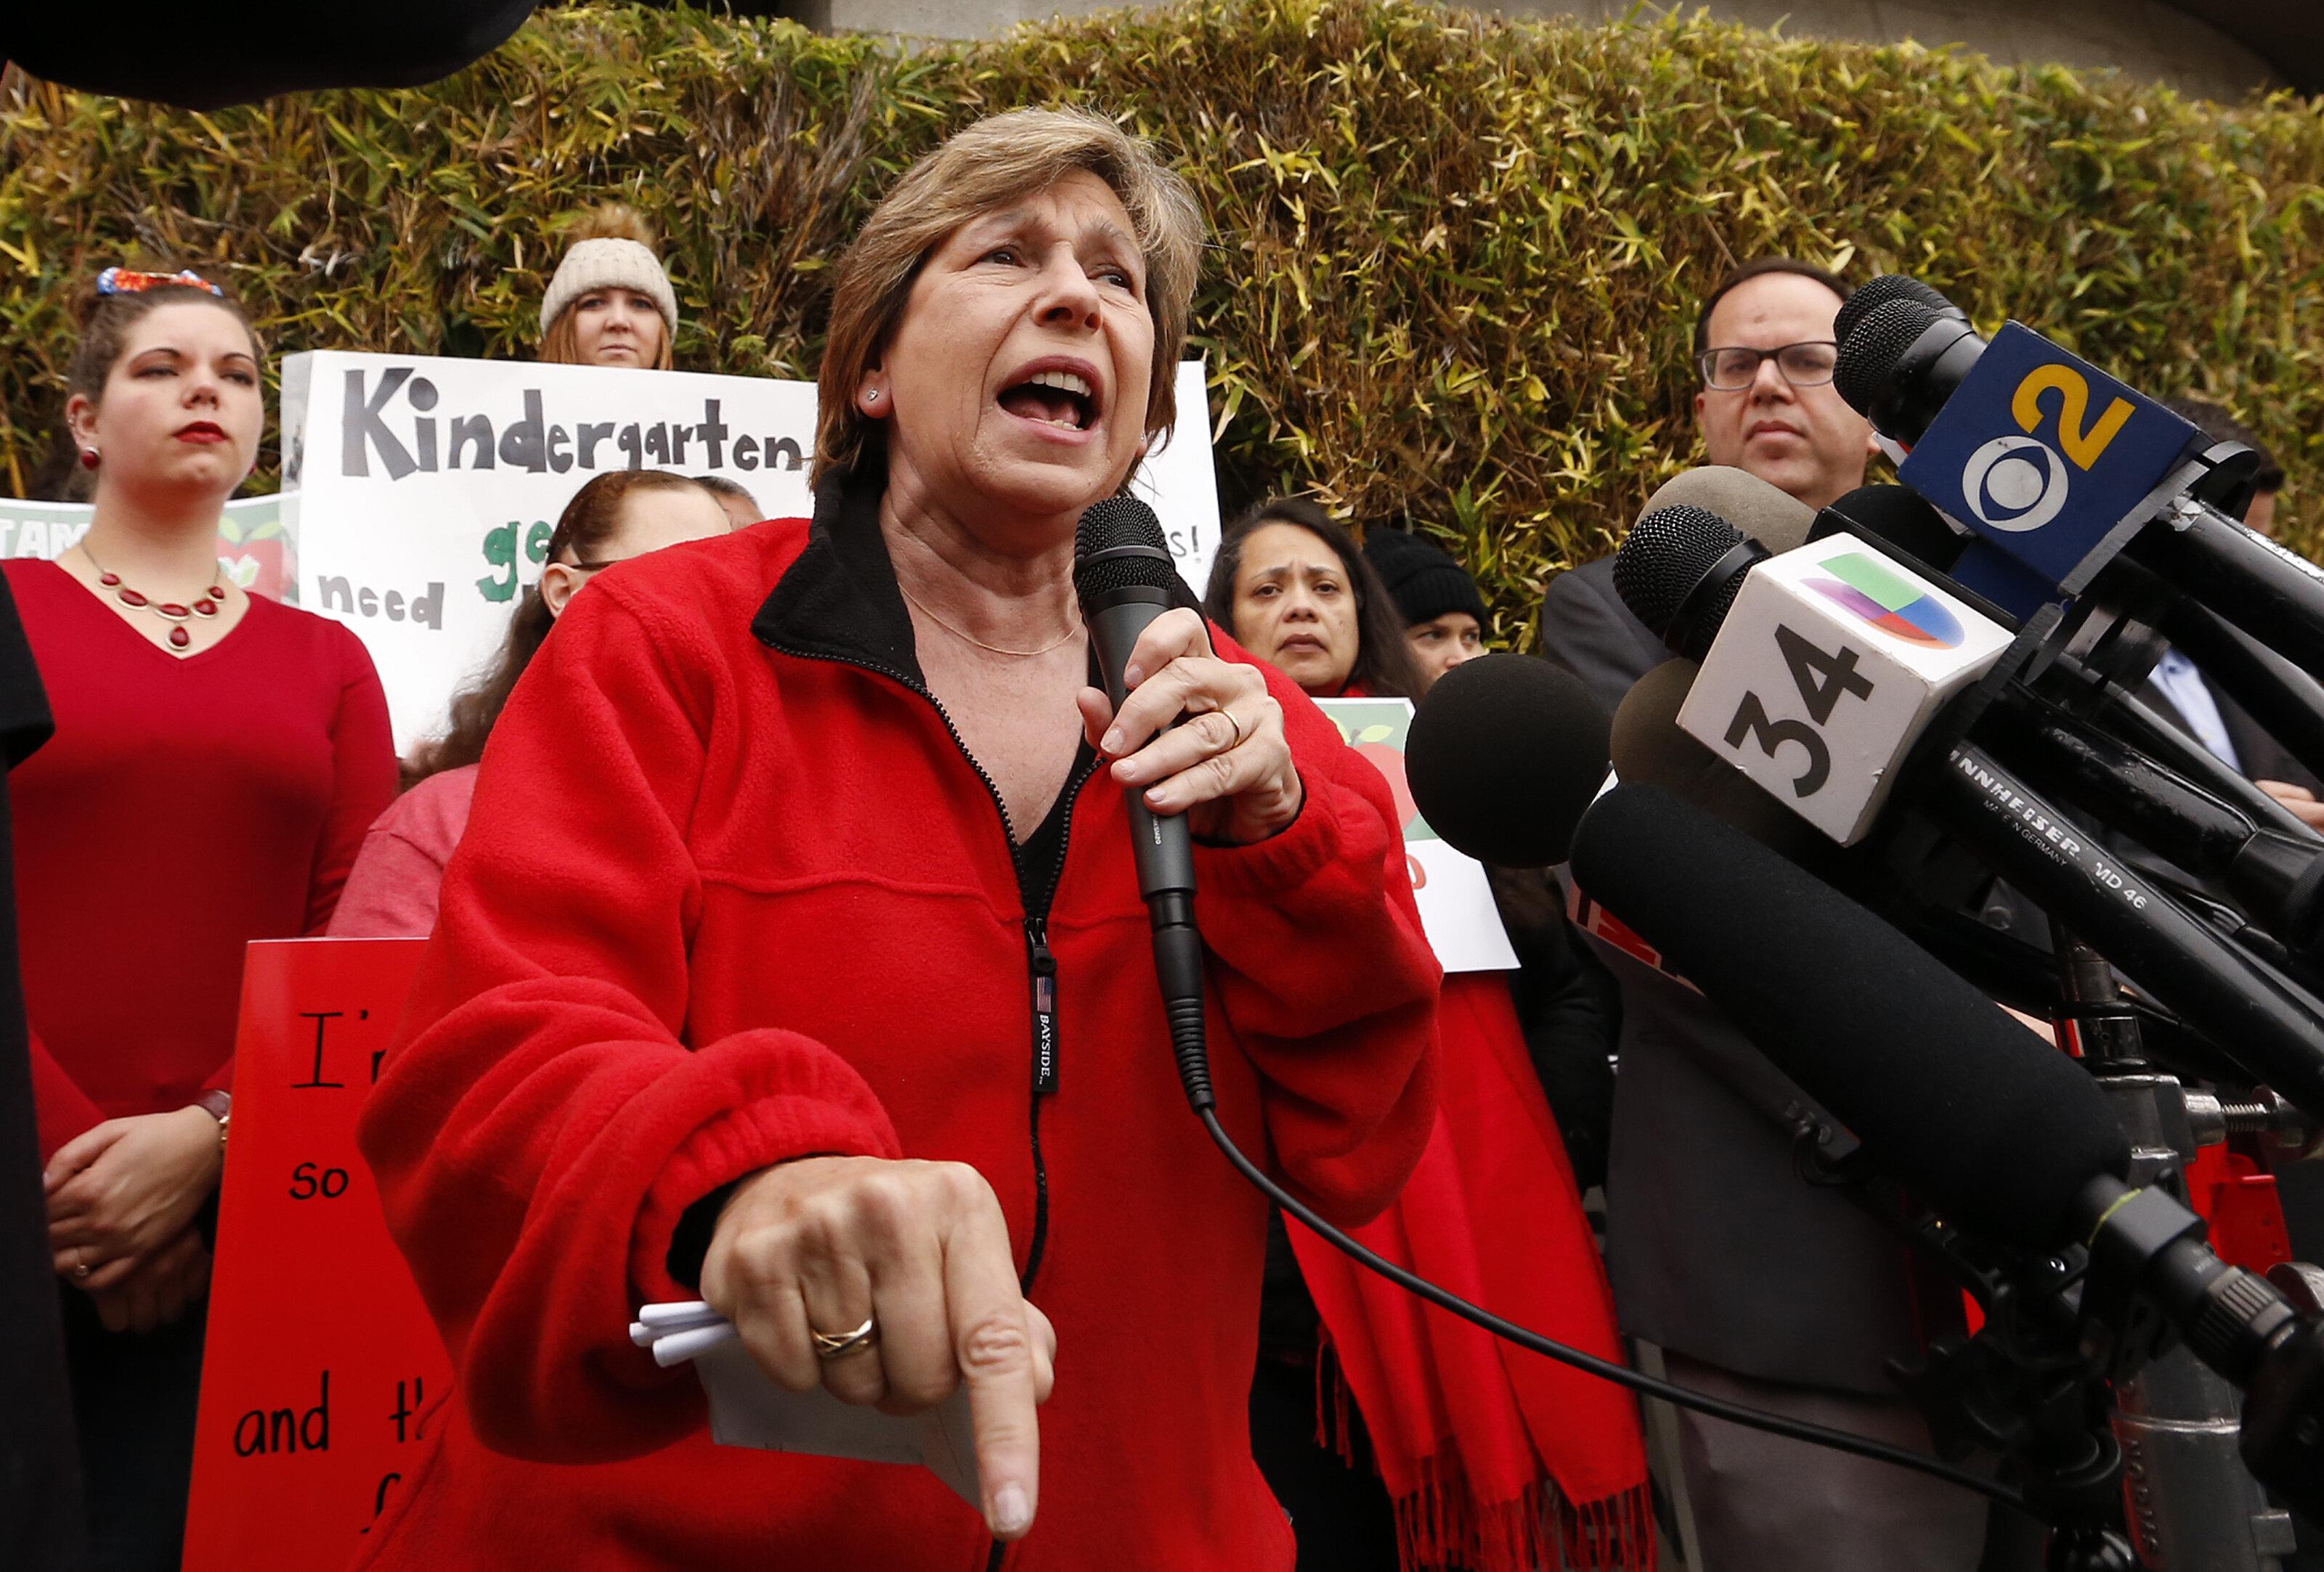 Randi Weingarten, an influential figure in Democratic politics, treads carefully in internecine party debates.